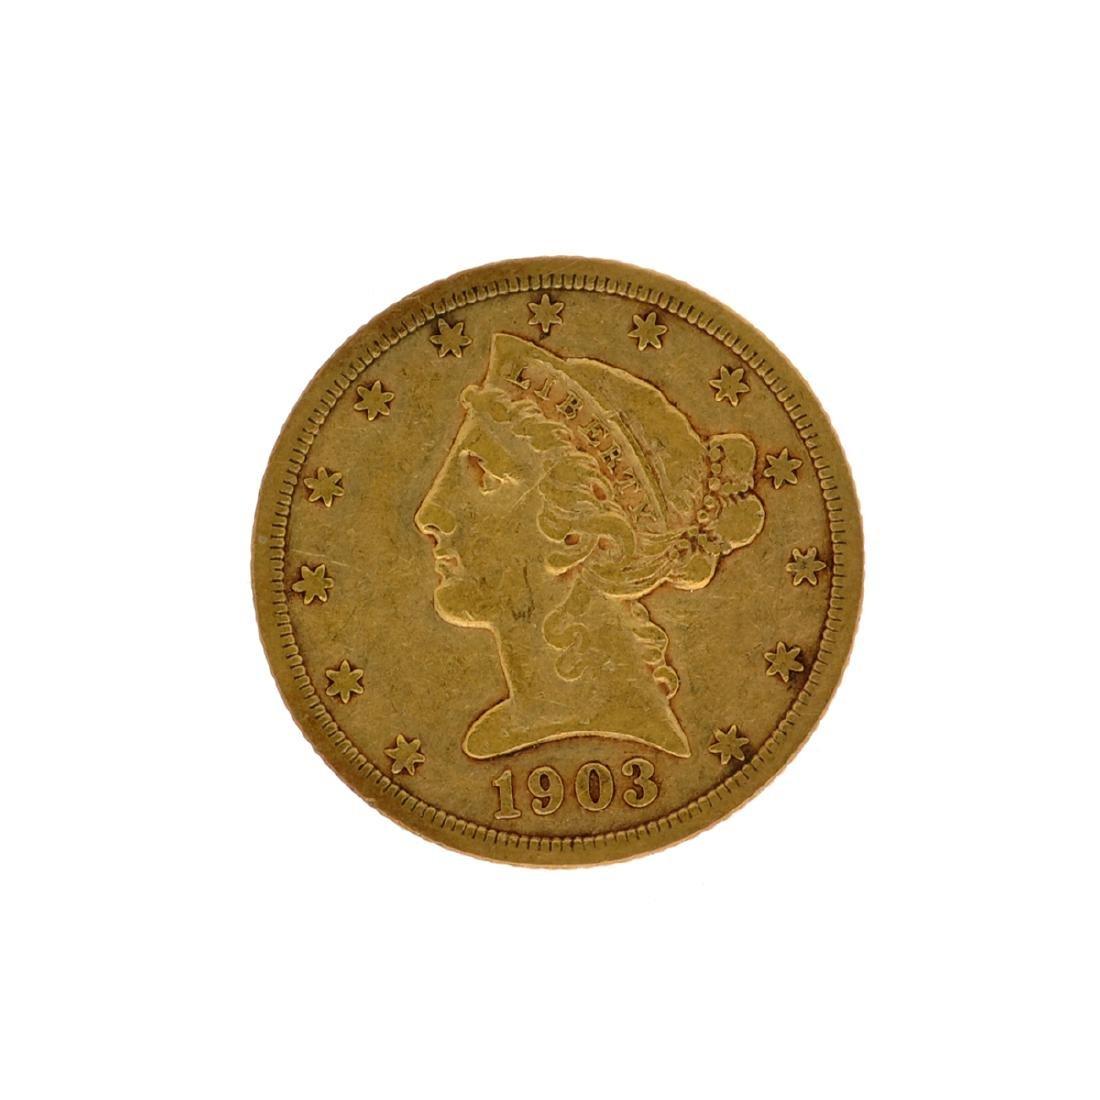 *1903-S $5 Liberty Head Gold Coin (DF)